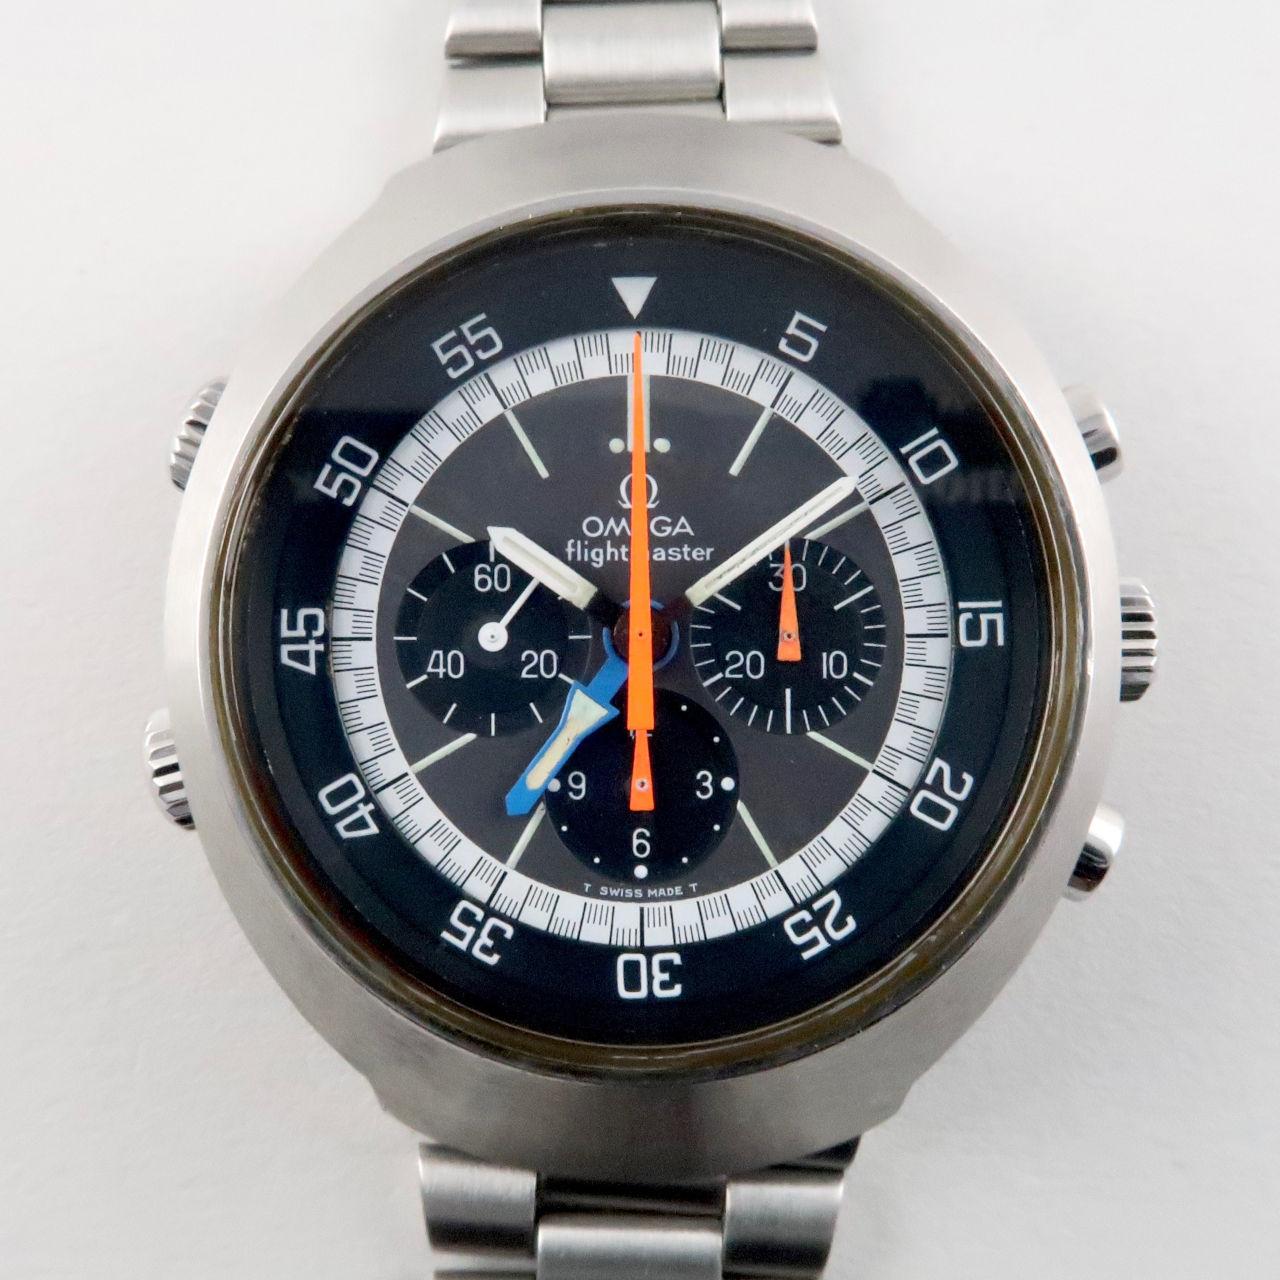 omega-flightmaster-ref-145-036-steel-vintage-chronograph-circa-1973-wxofm1-v100